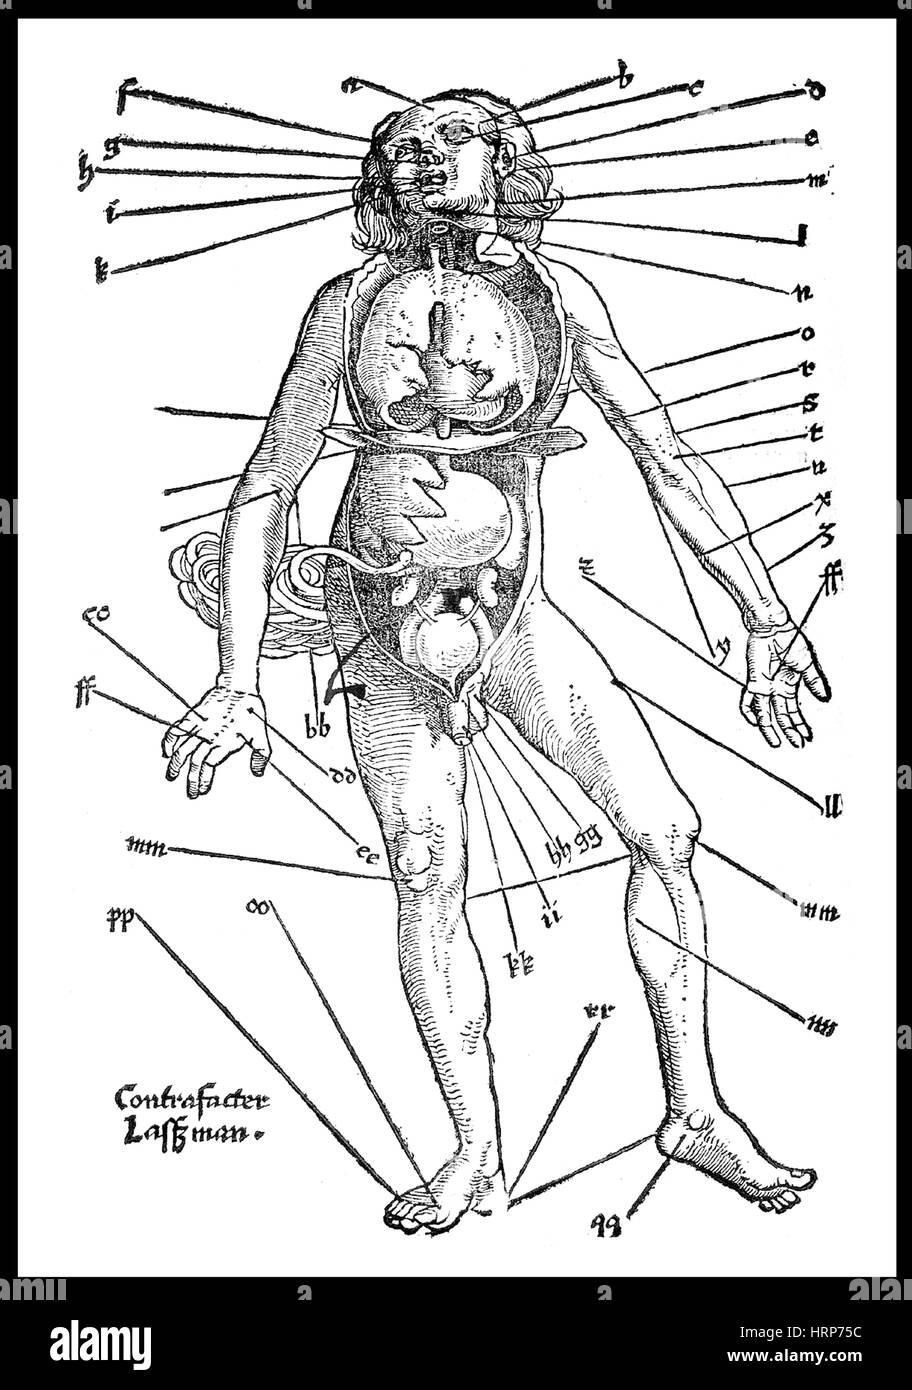 Bloodletting, 'Feldbuch der Wundartzney', 1528 - Stock Image